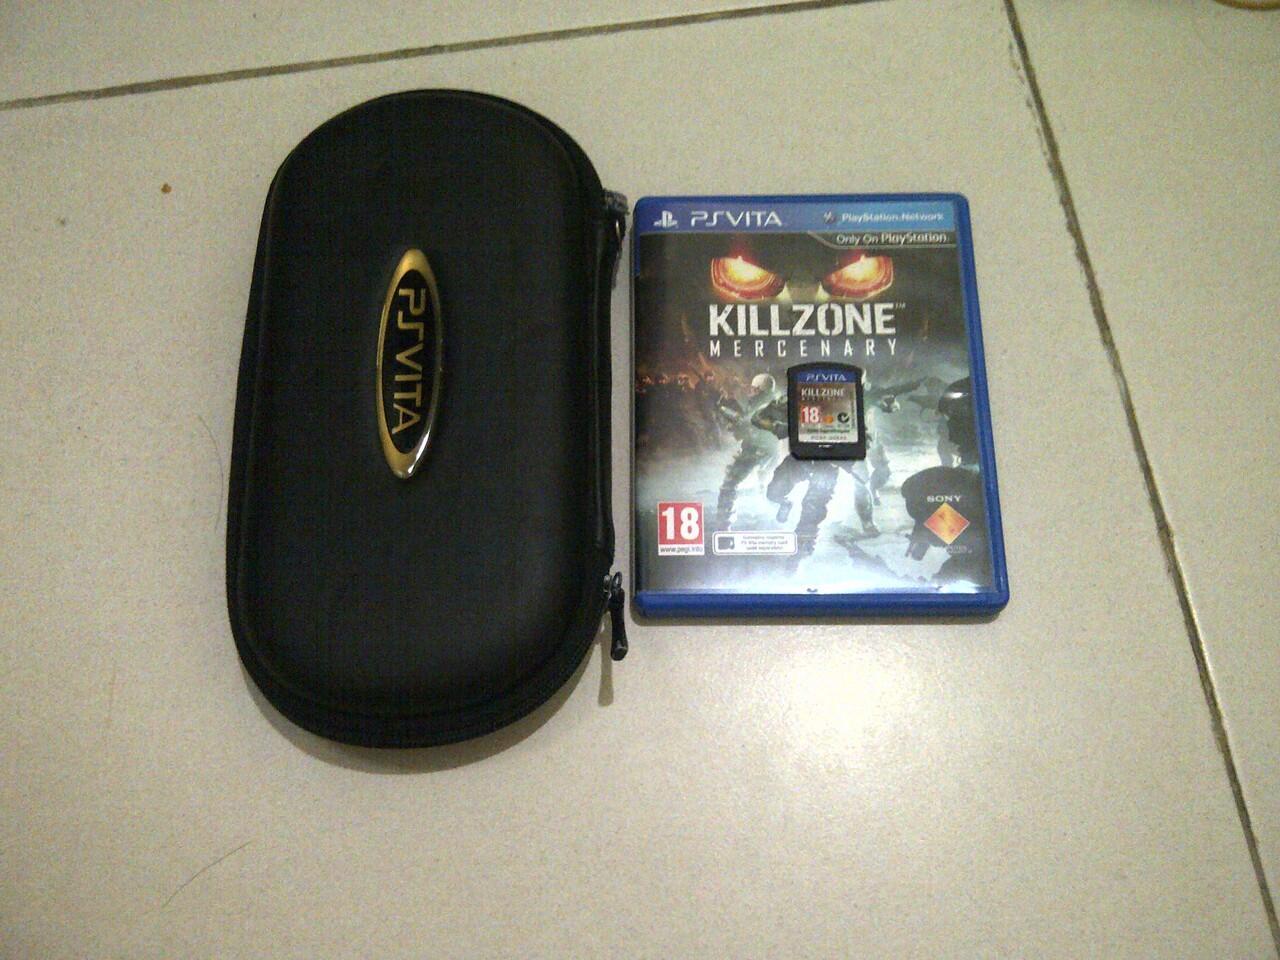 WTS Killzone Mercenary reg 2 Eur + pouch vita